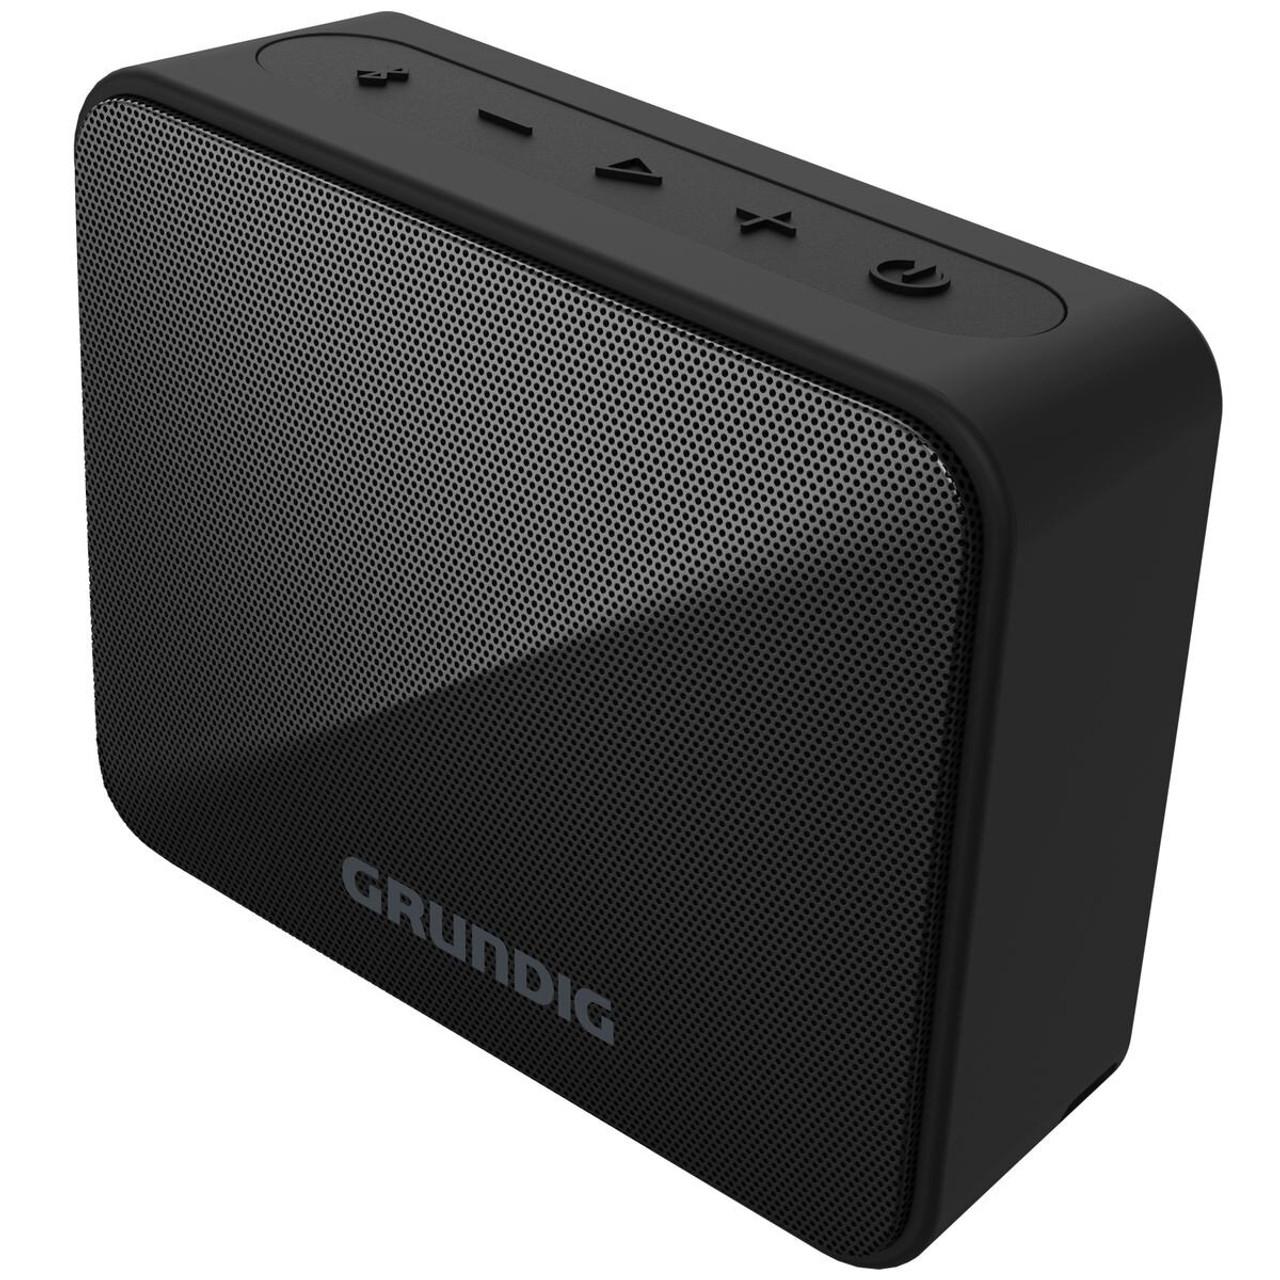 Grundig GLR7749 GBT Solo Waterproof Bluetooth Speaker - Black